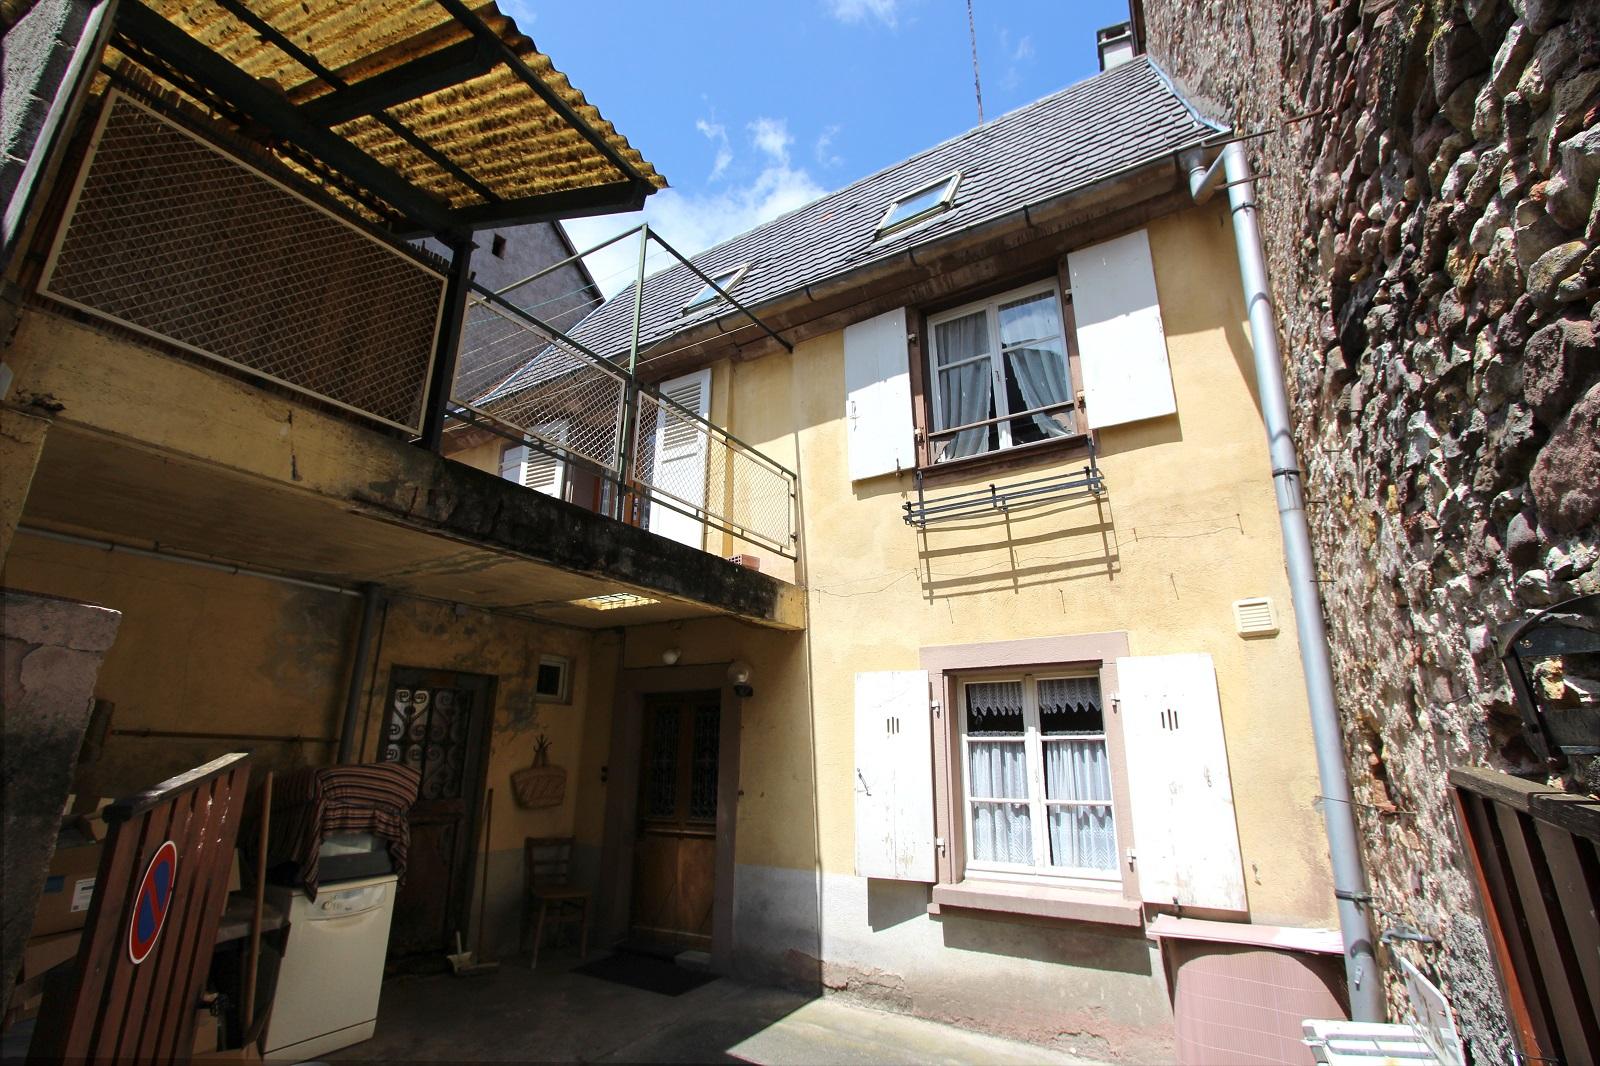 Bergheim – Maison à rénover